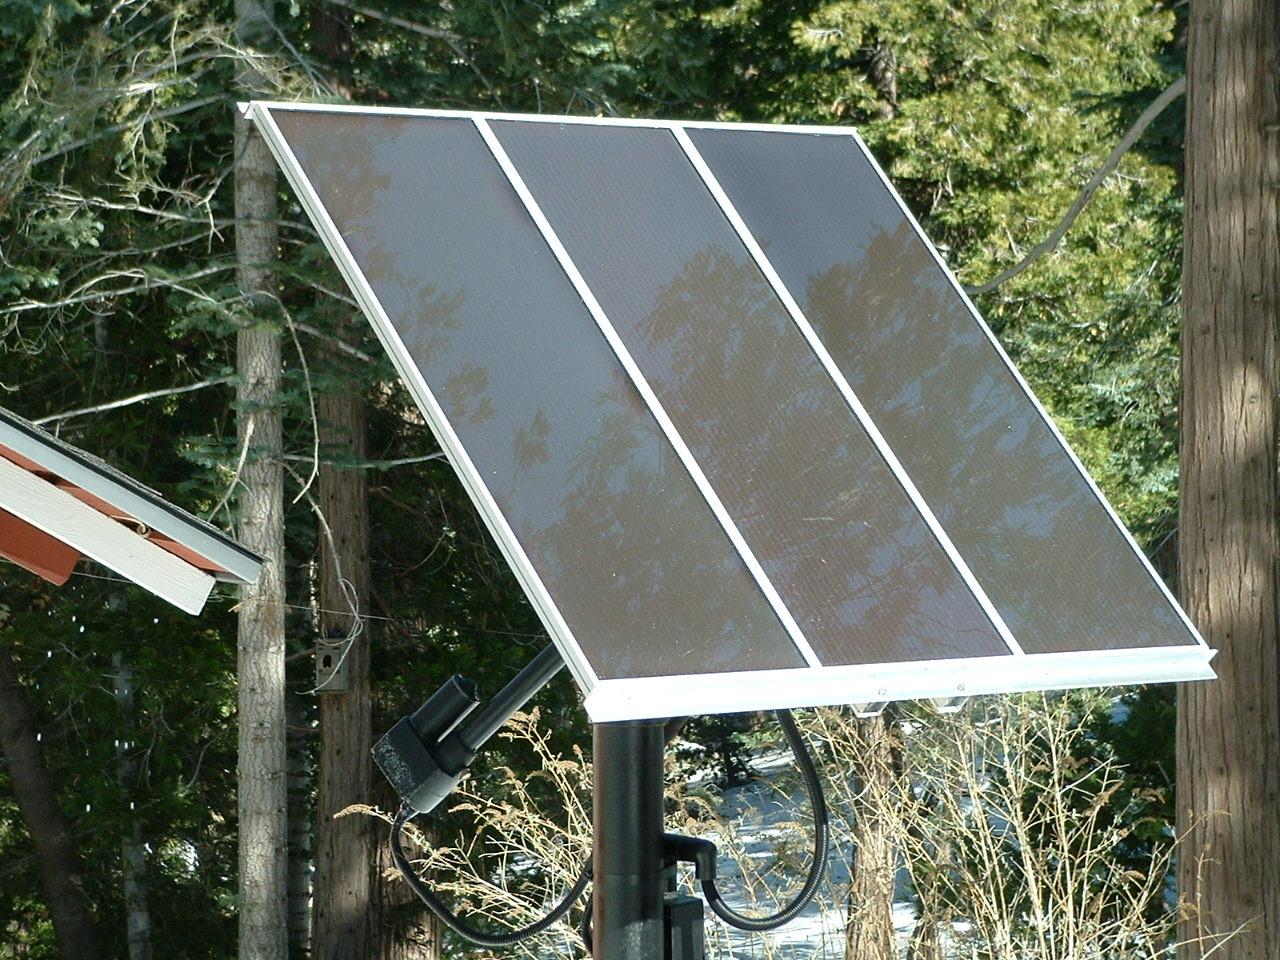 Harbor Freight 100w Solar Kit Full Review Day 1 Best Solar Panel System